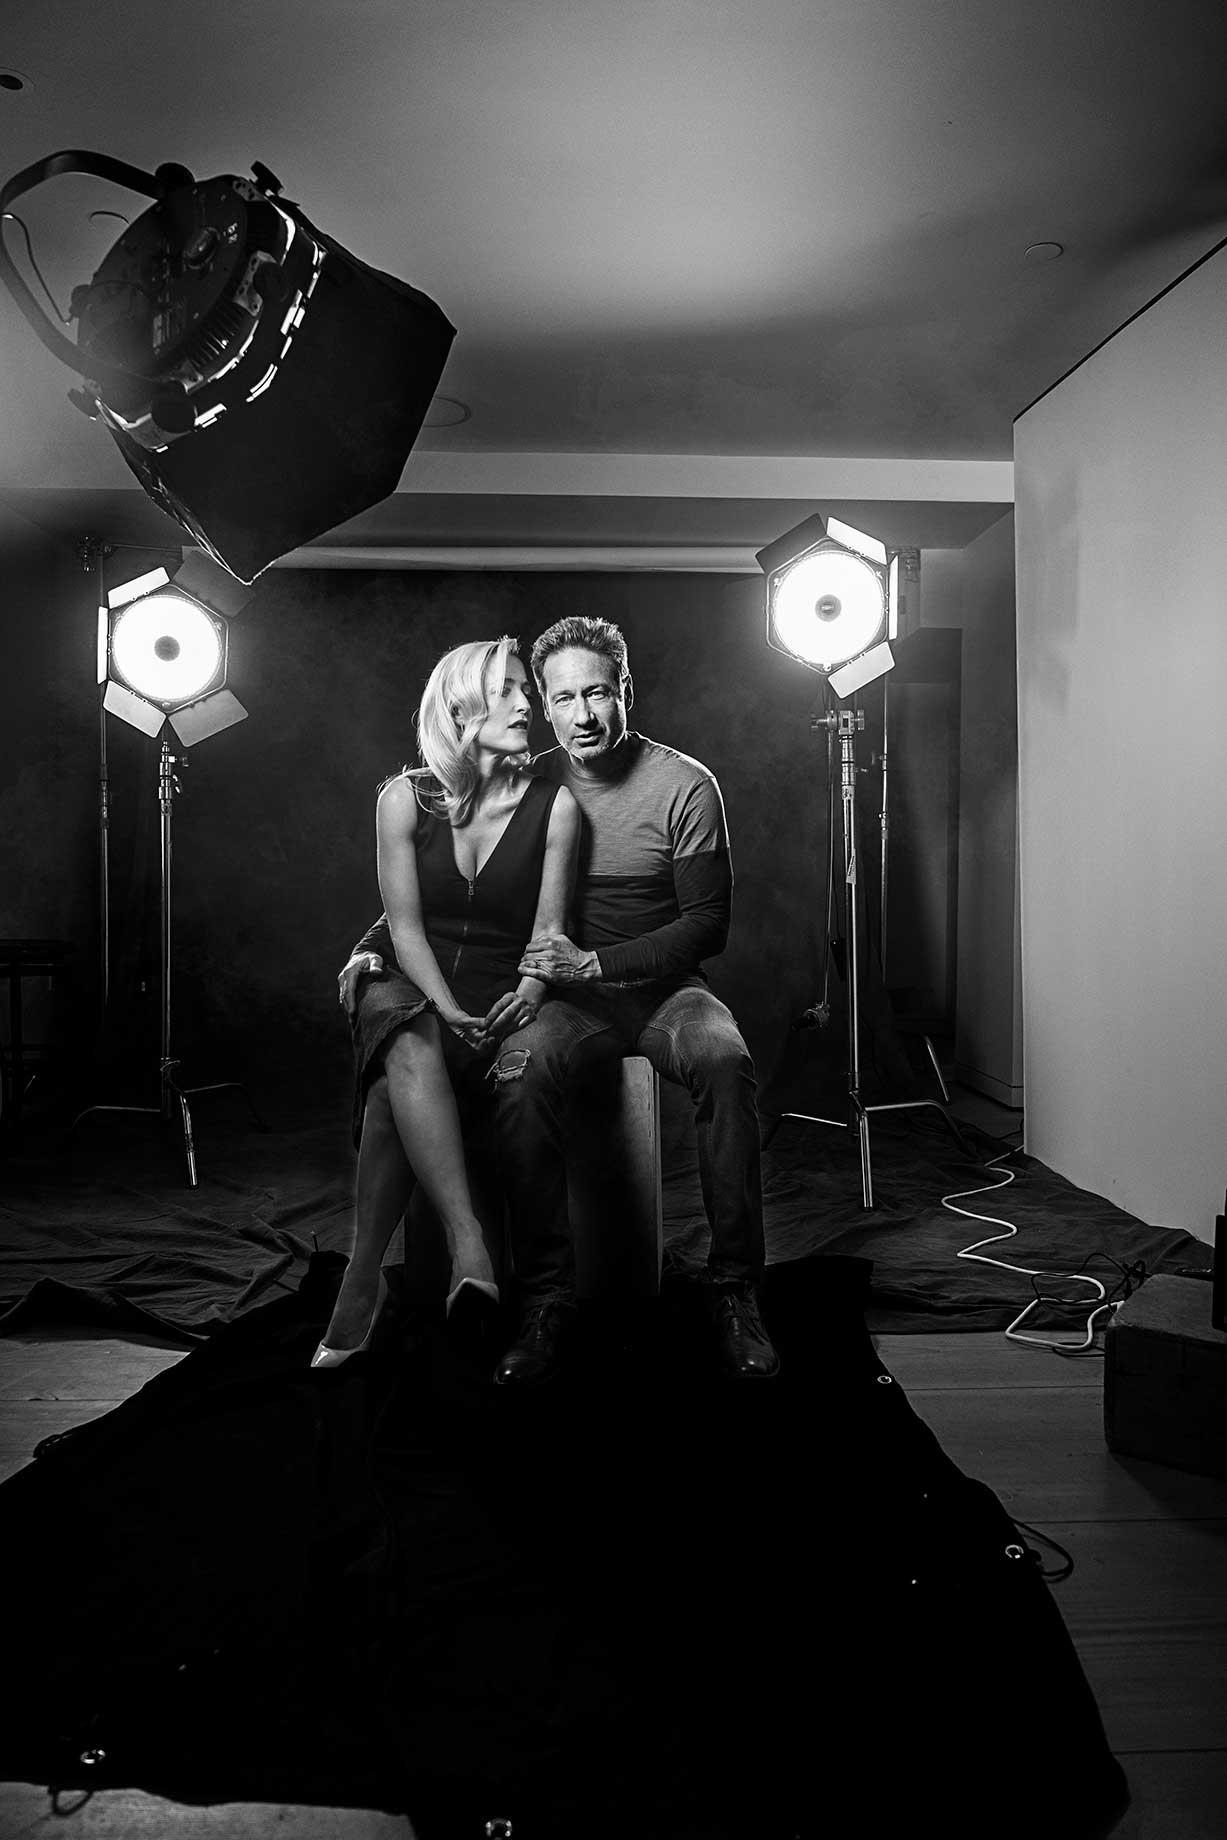 Gillian-Anderson-David-Duchovy---X-Files-23-3.jpg